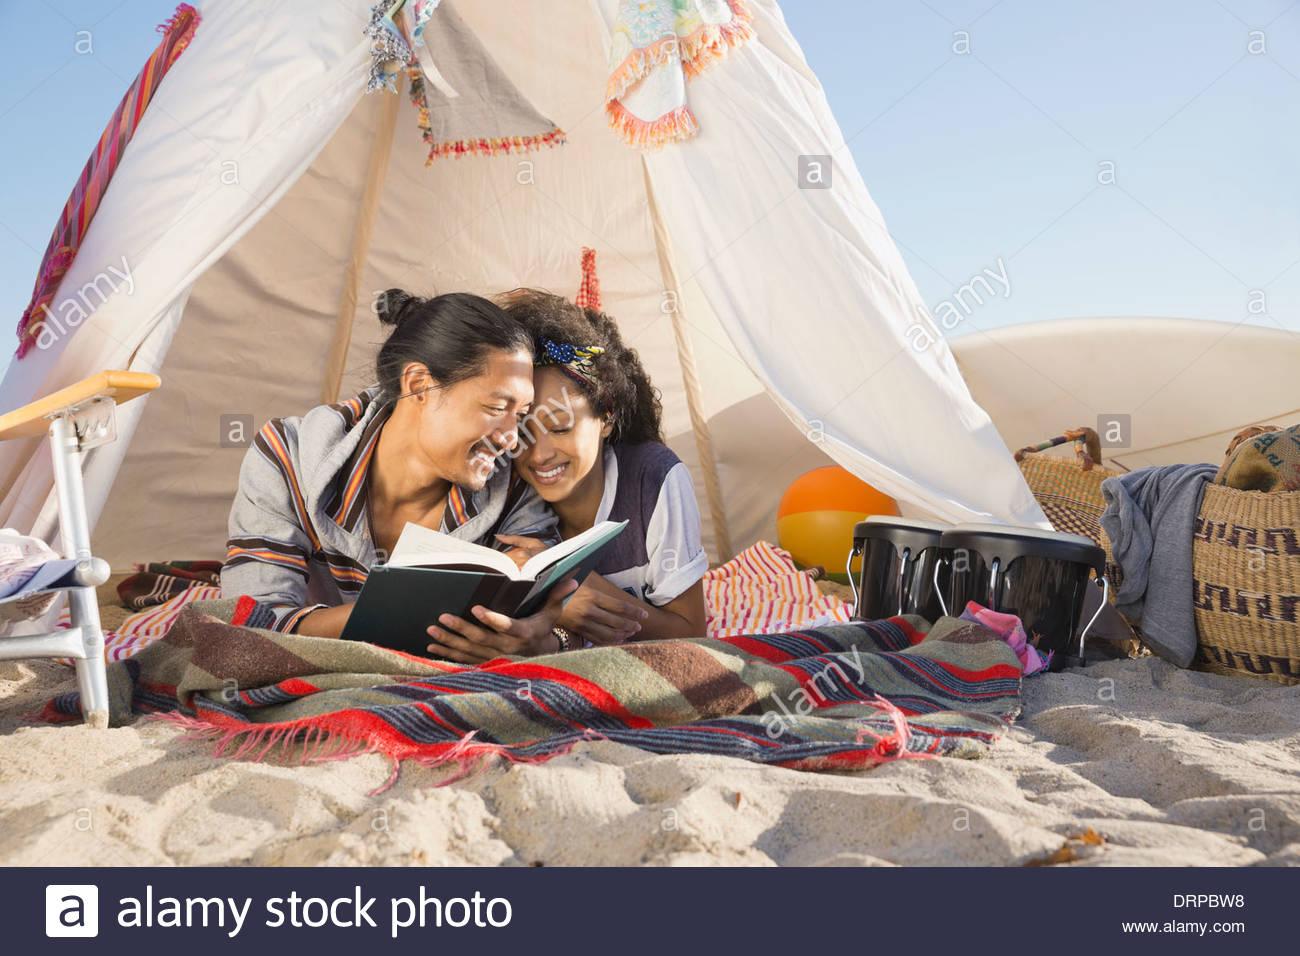 Romantic couple reading book on beach - Stock Image